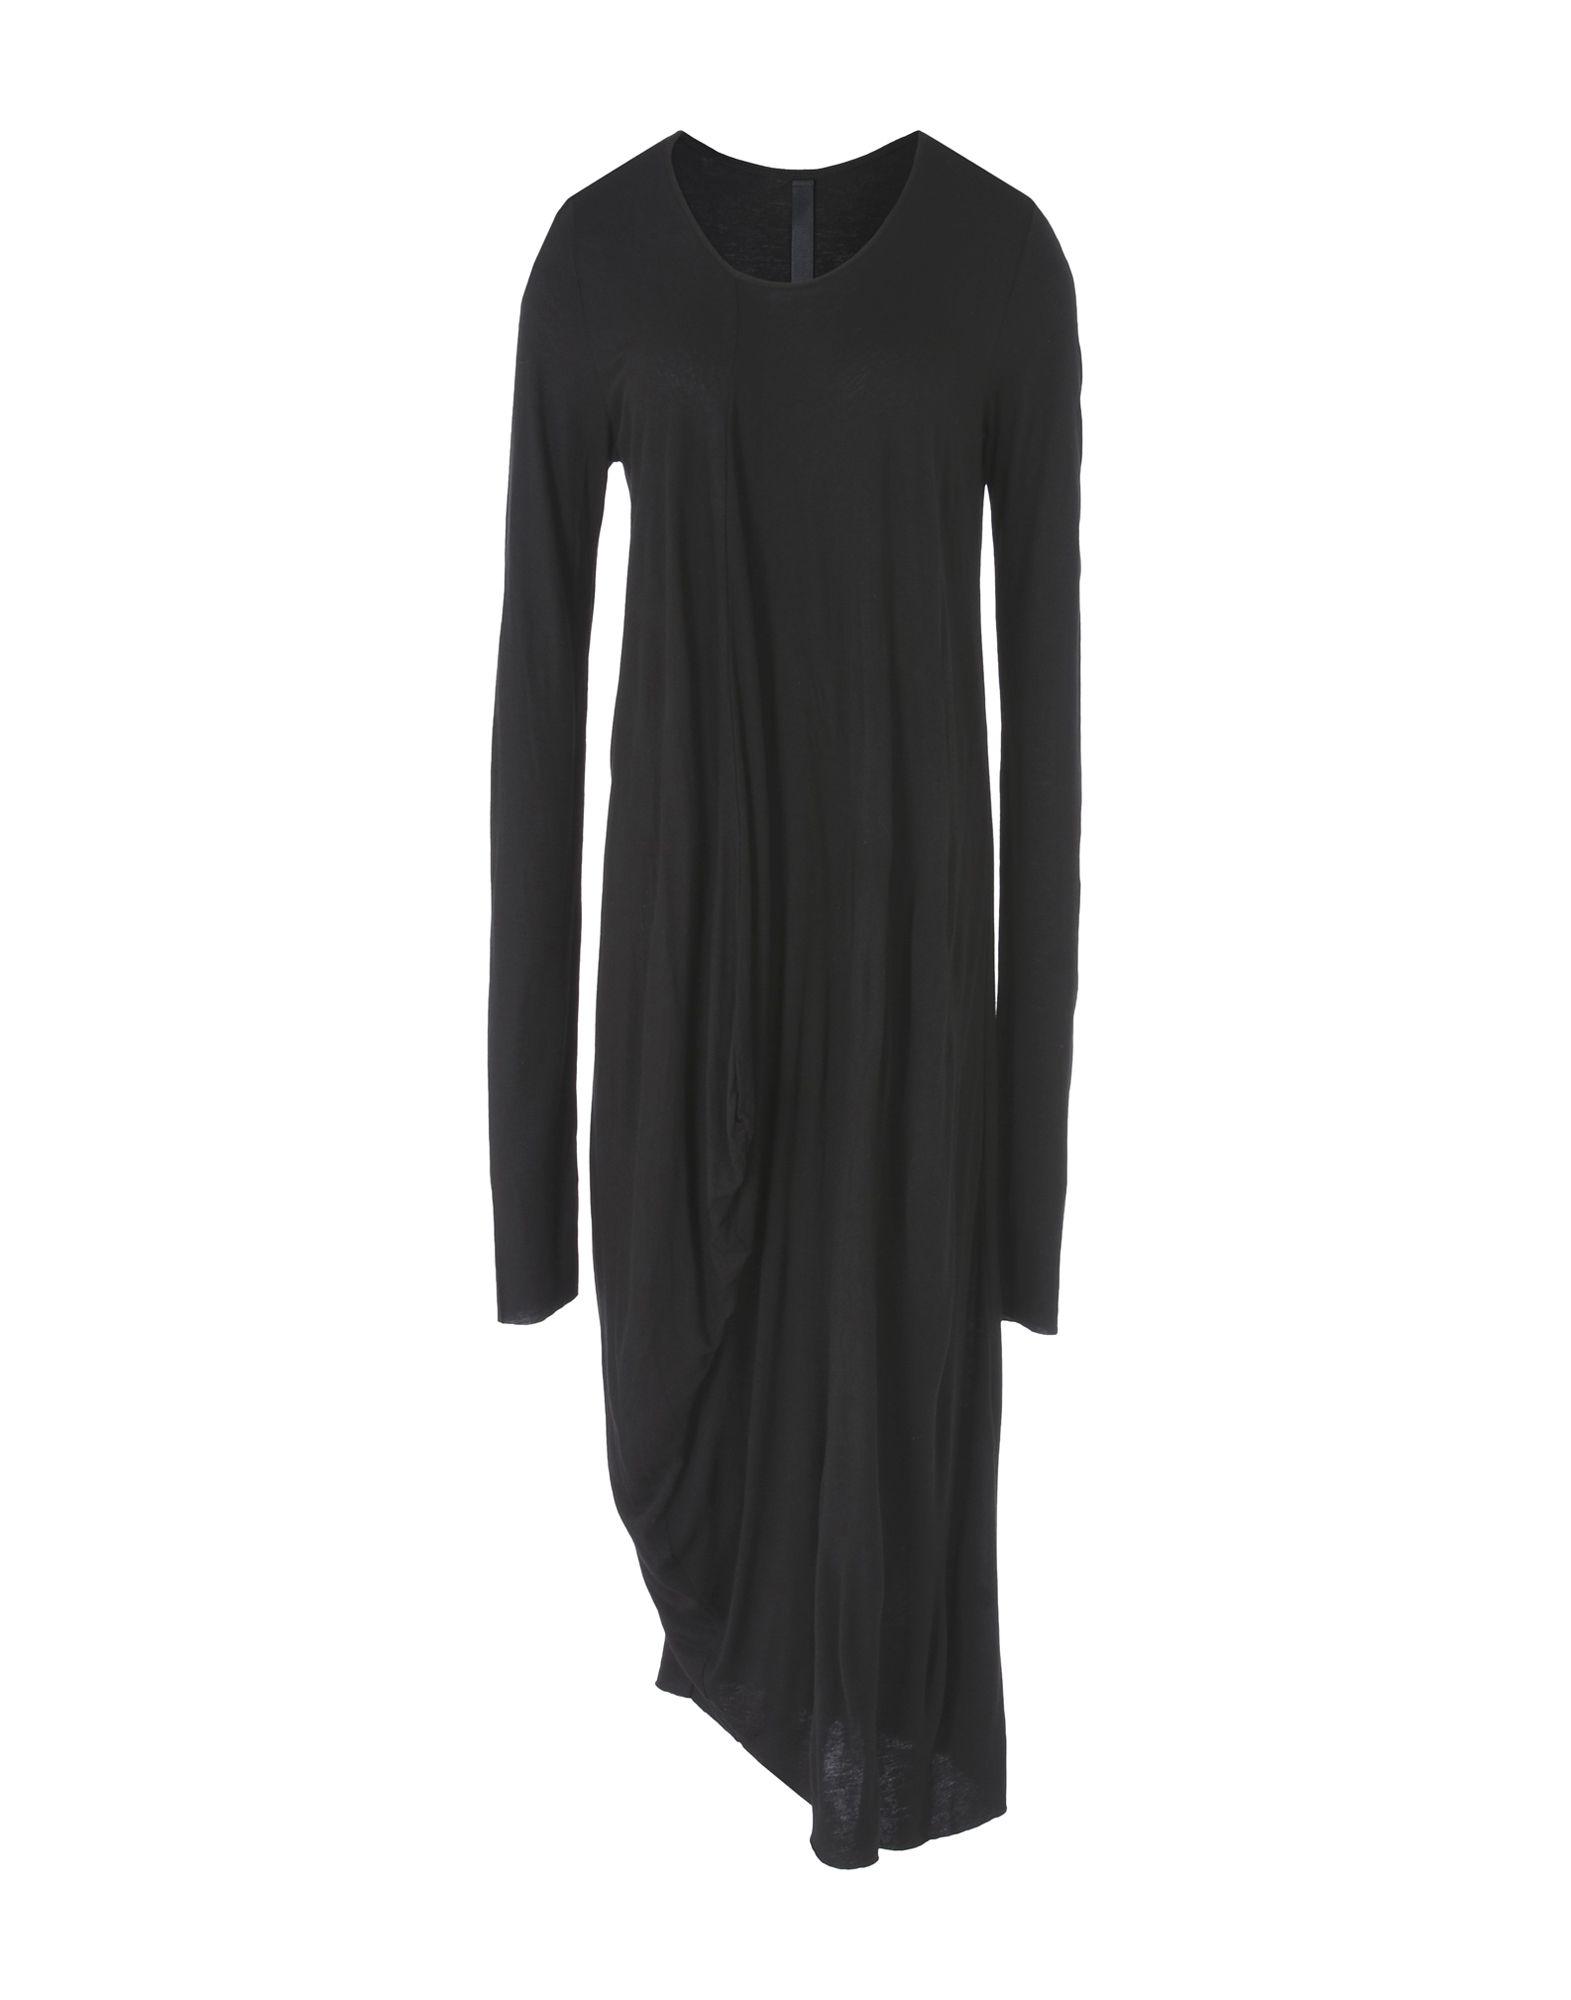 POÈME BOHÈMIEN Платье длиной 3/4 lisa corti платье длиной 3 4